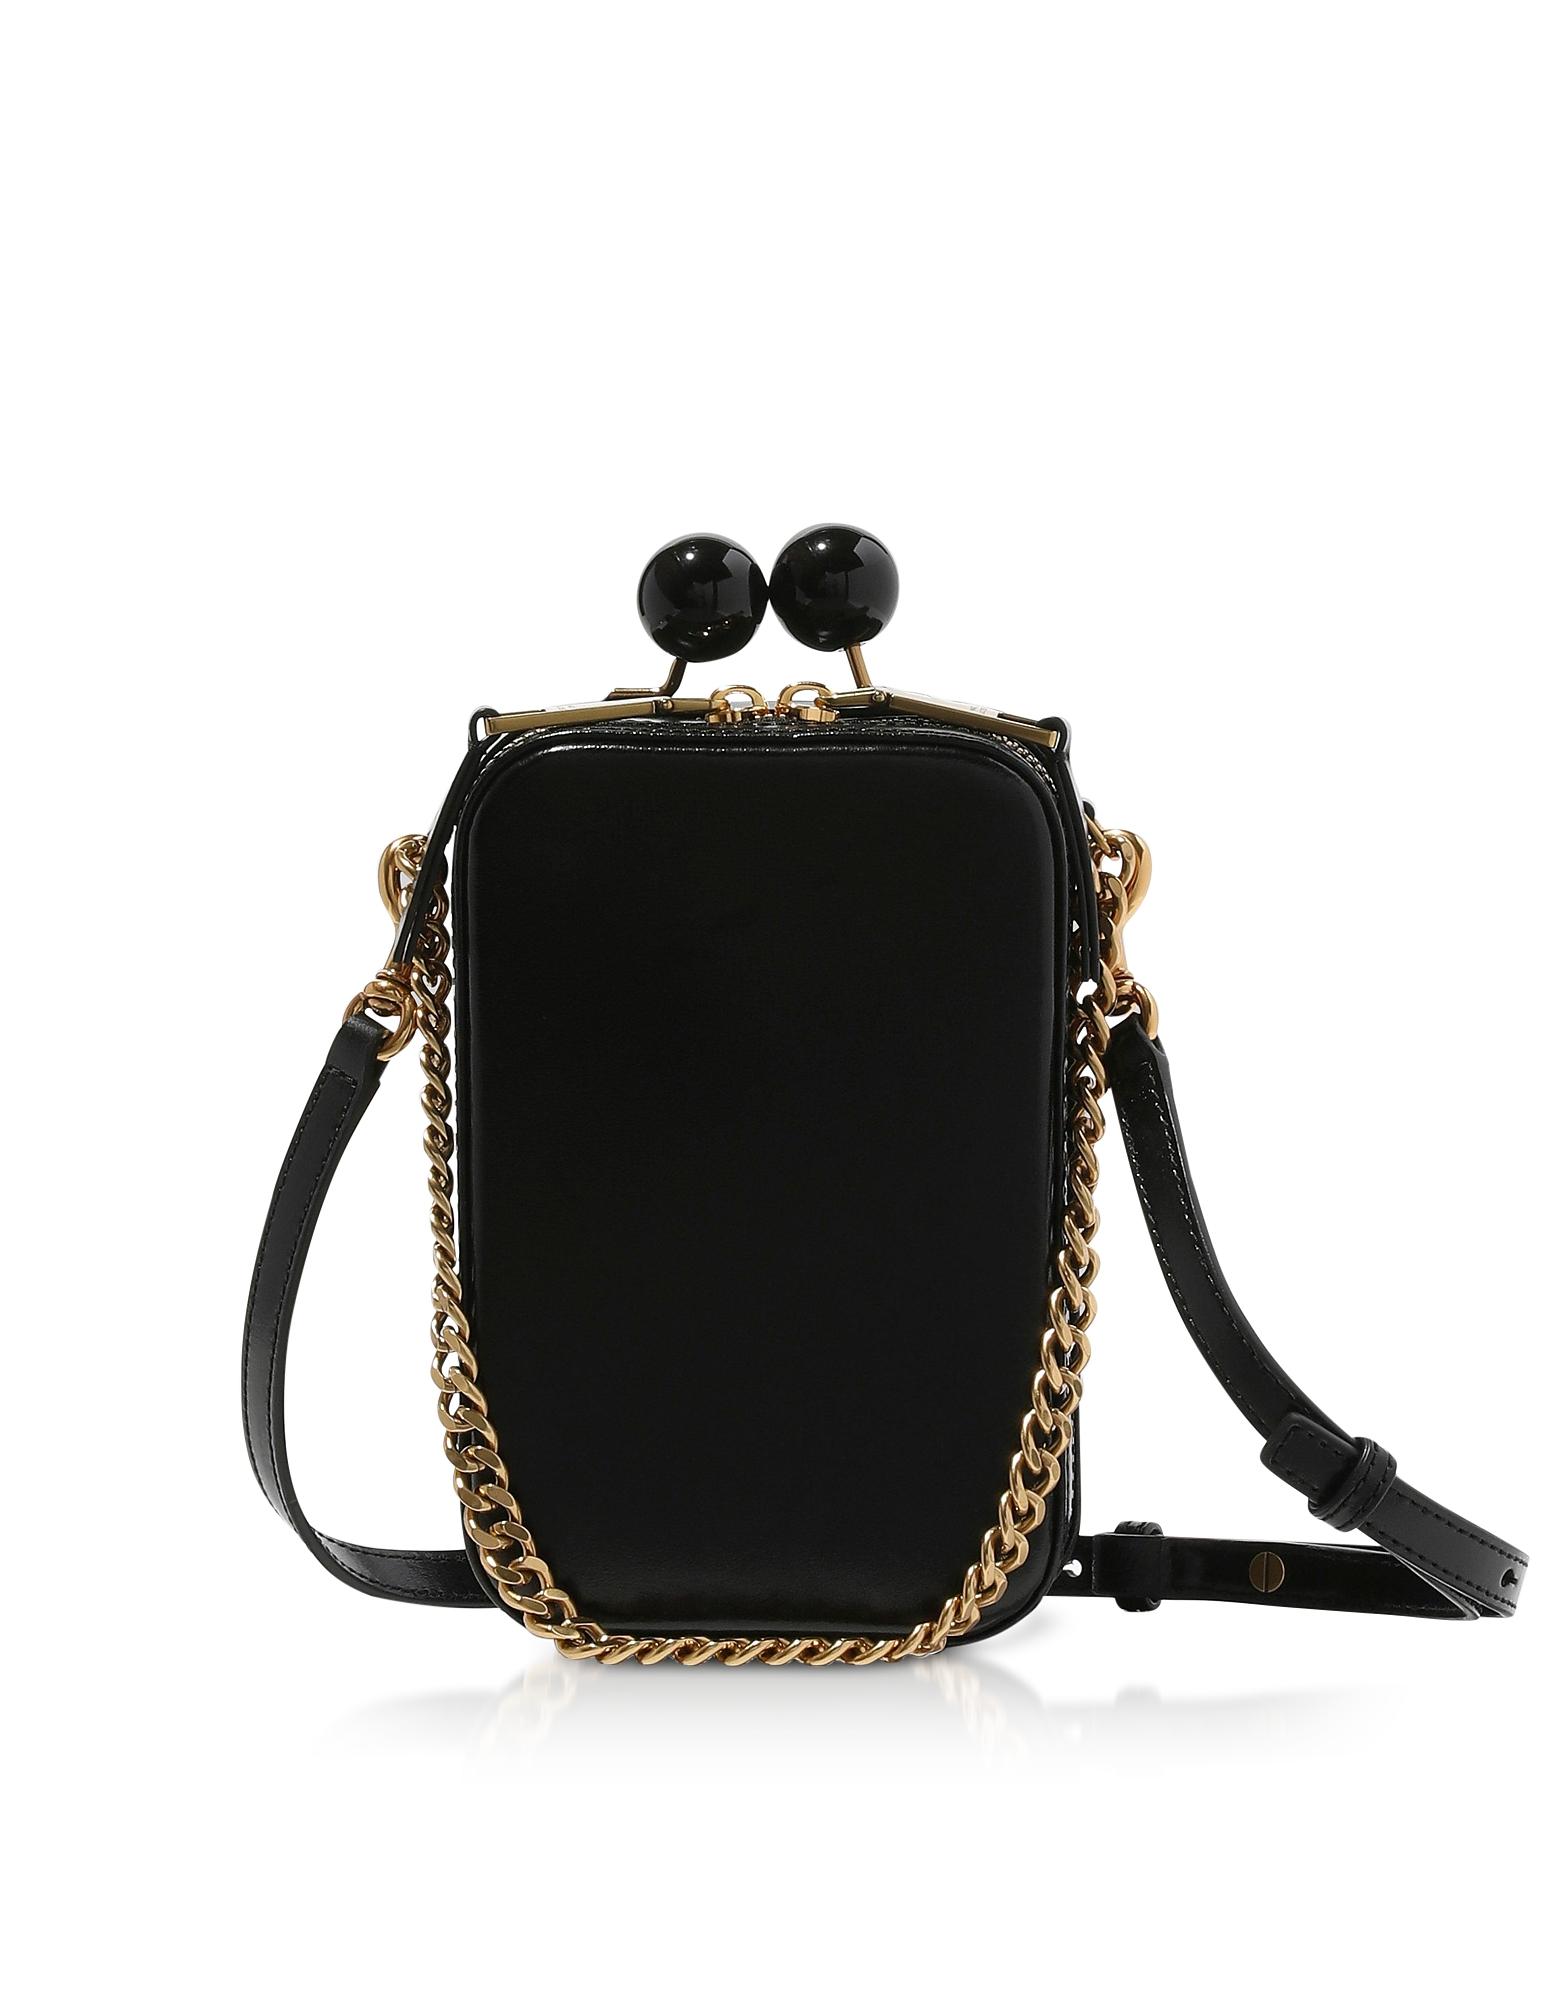 Marc Jacobs Designer Handbags, Black Leather The Vanity Clutch